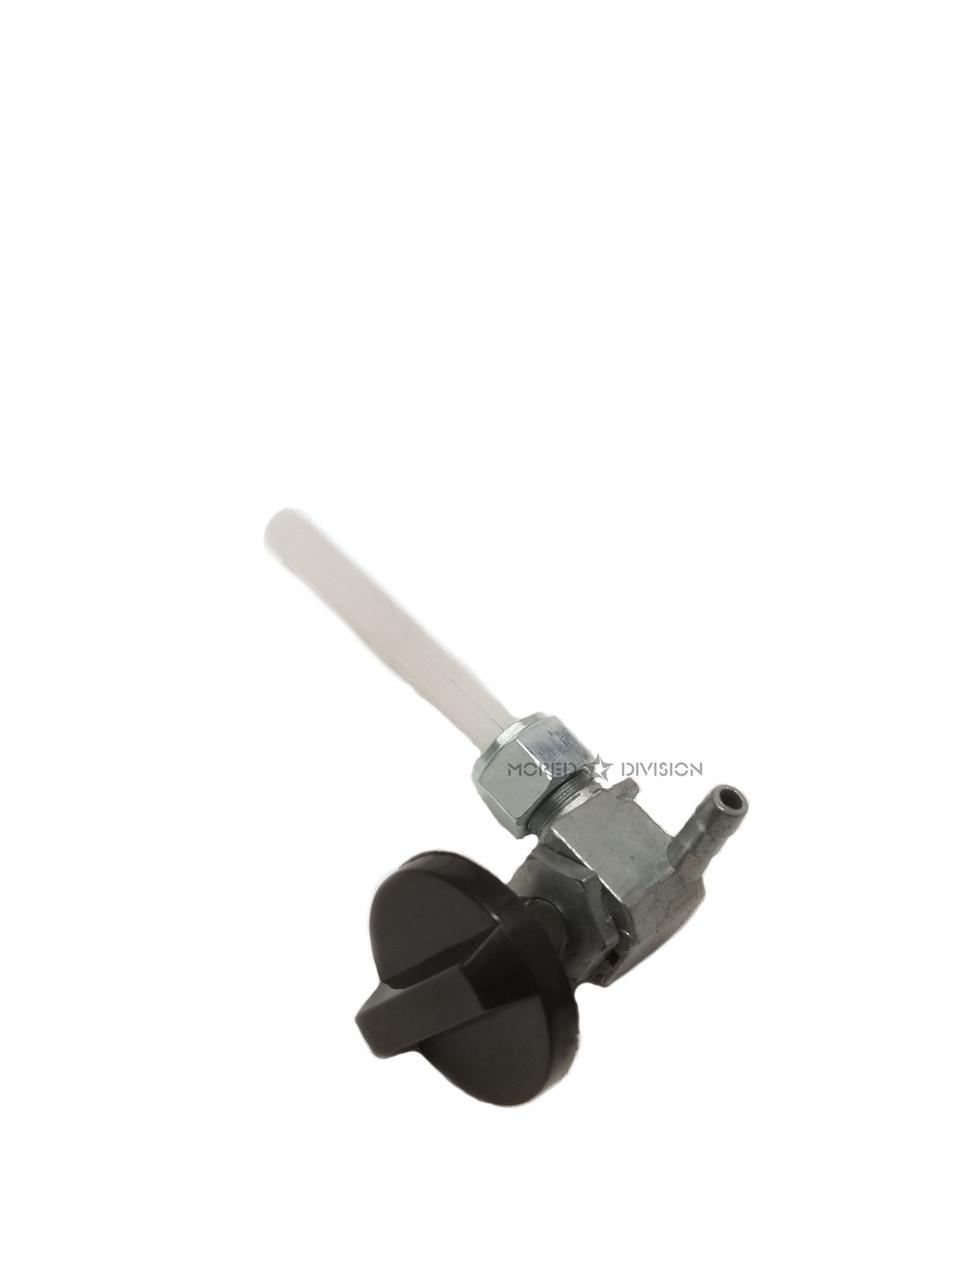 12mm x 1.00mm Right Flow Fuel Petcock *Round Knob*